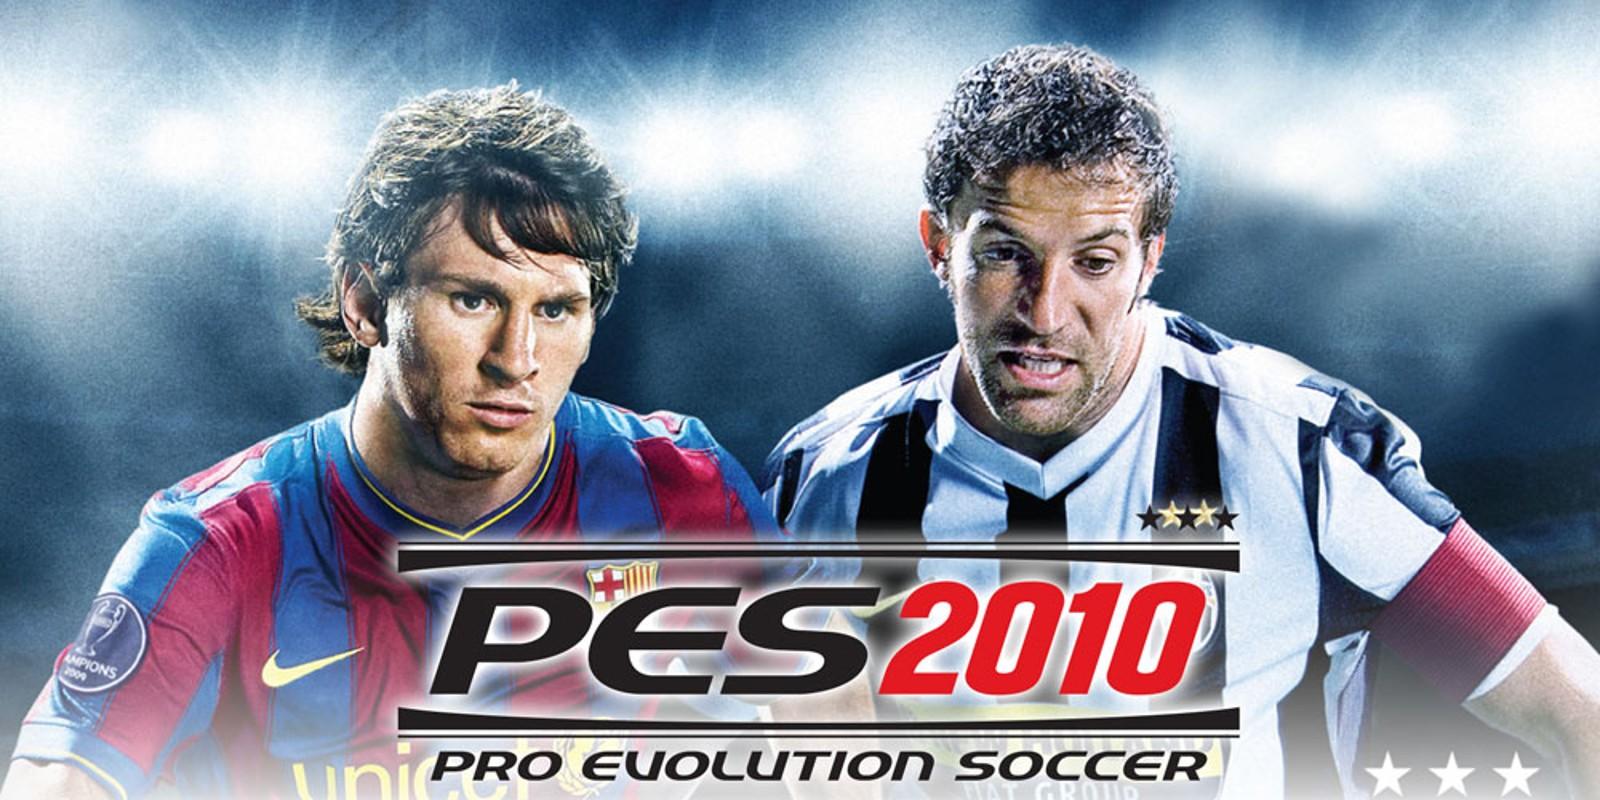 Pro Evolution Soccer 2010 Overview